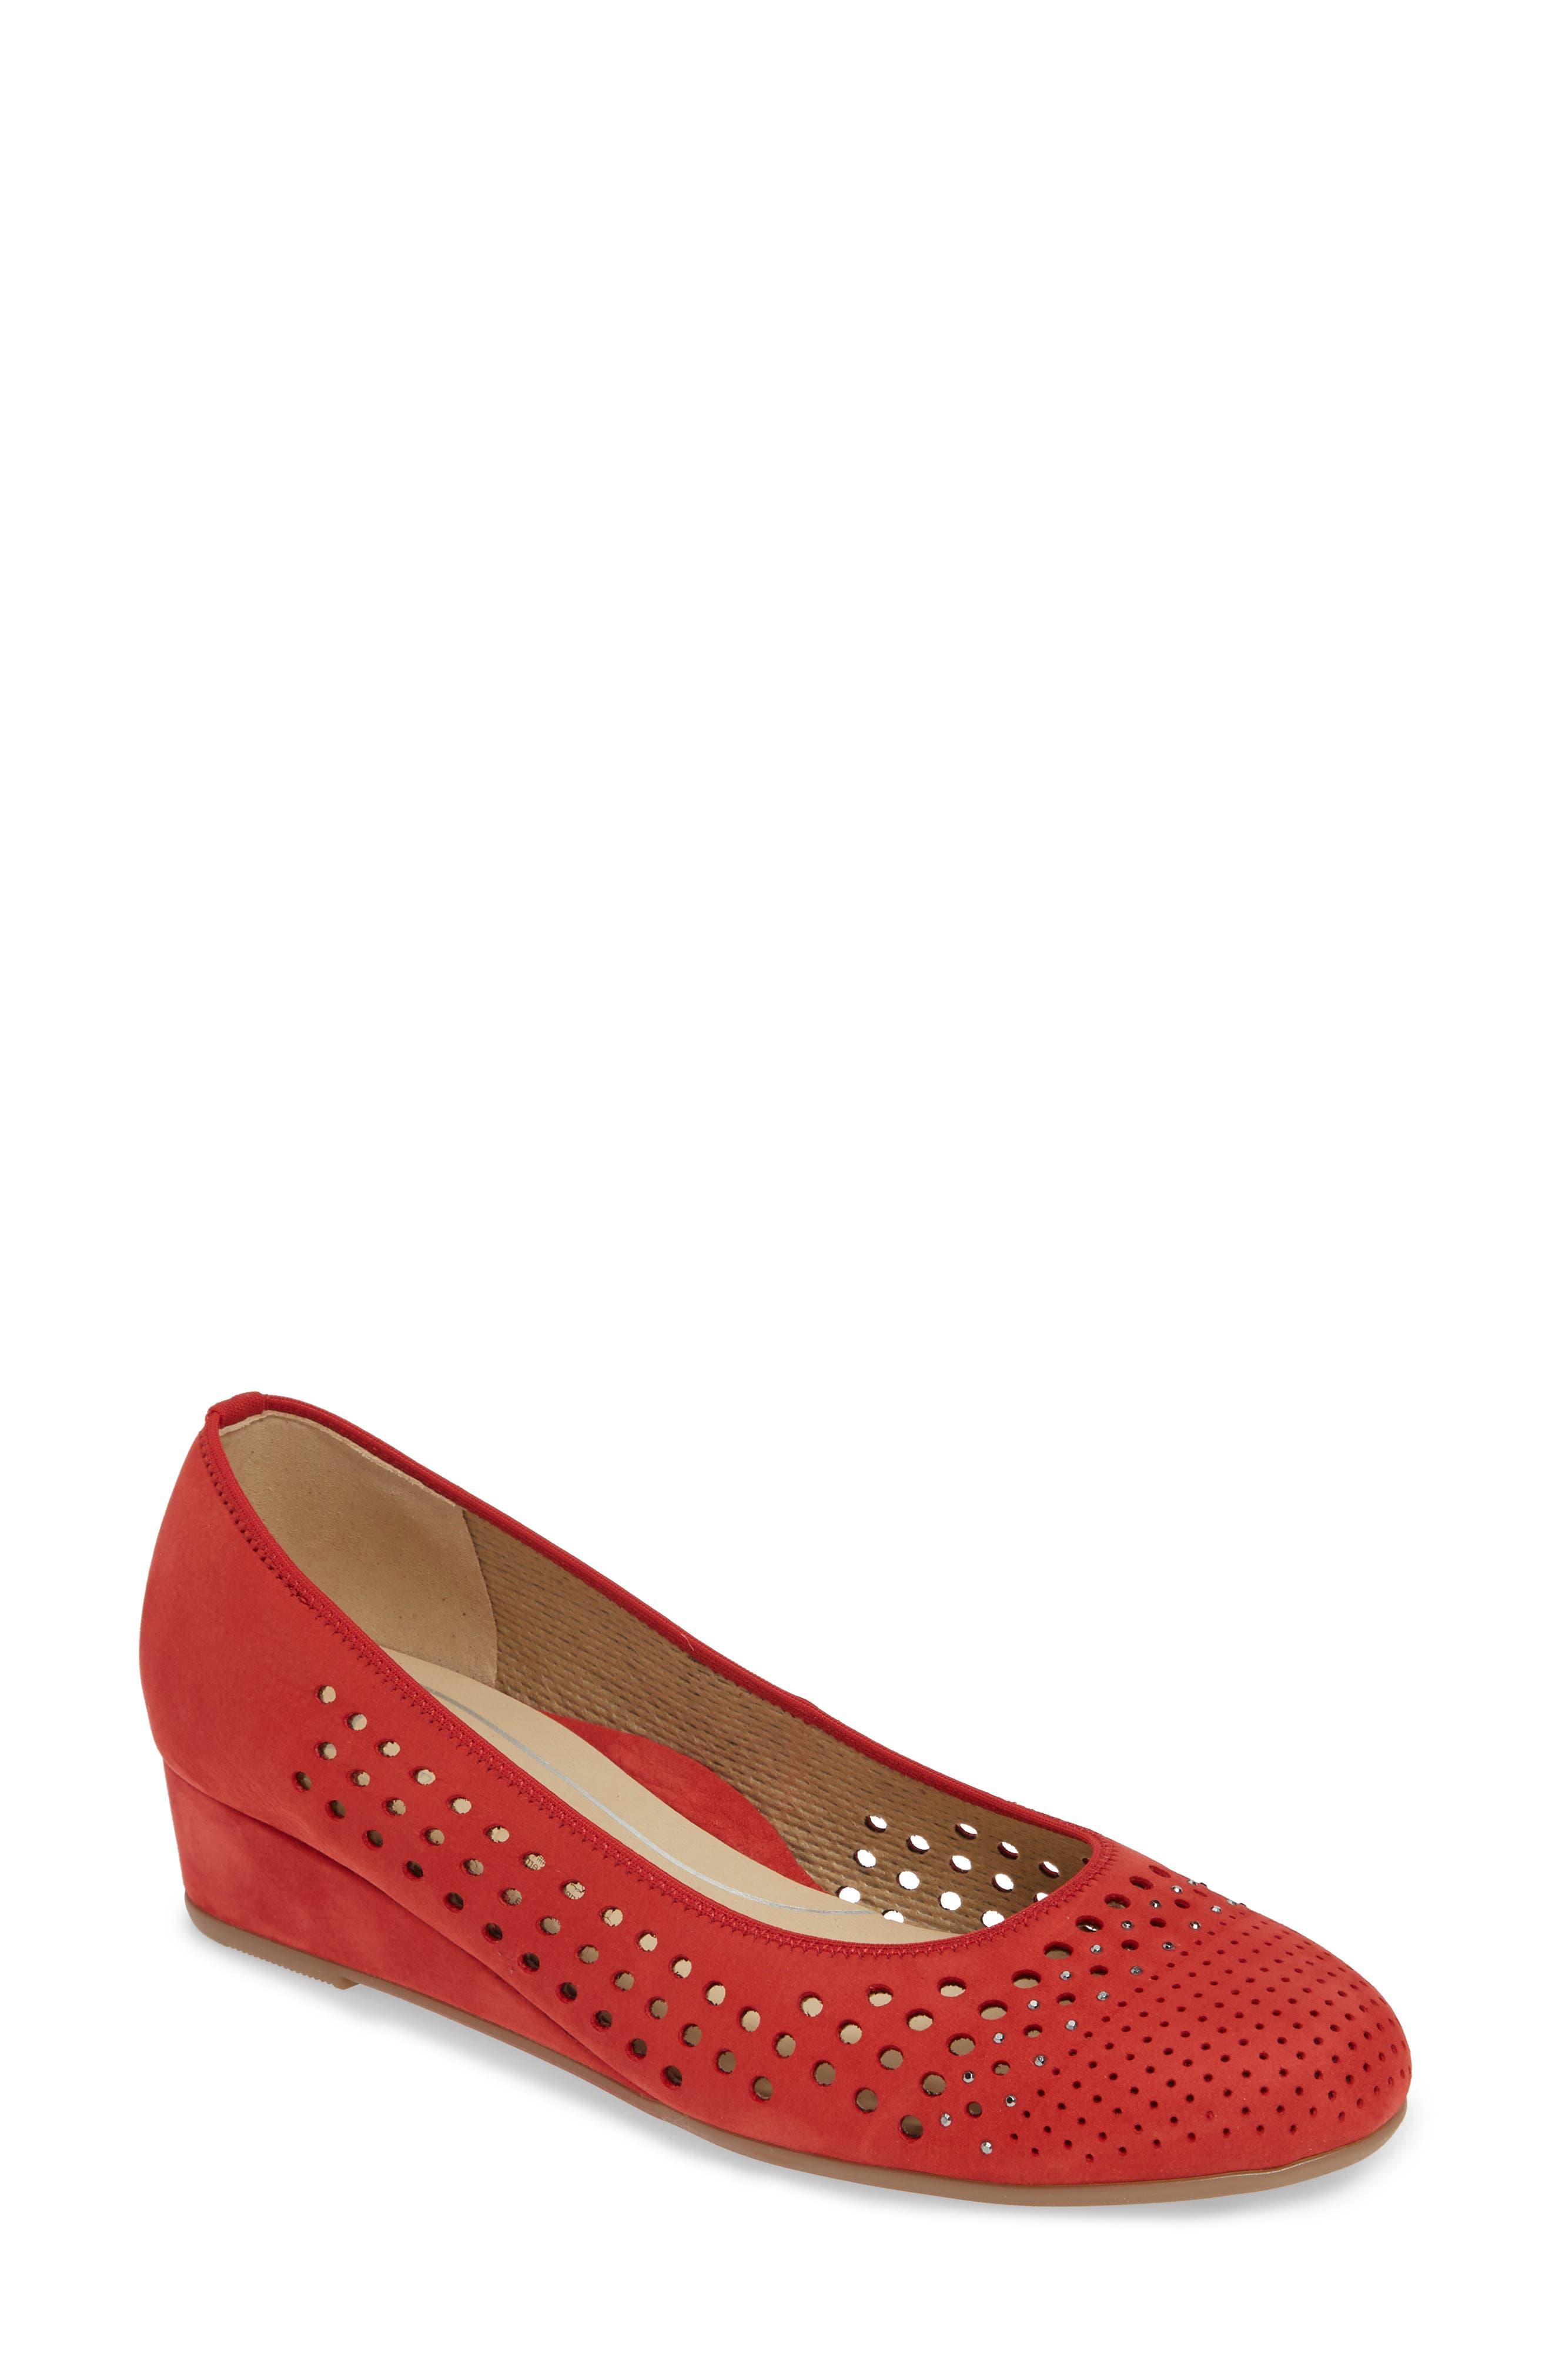 Ara Lois Wedge Pump - Red